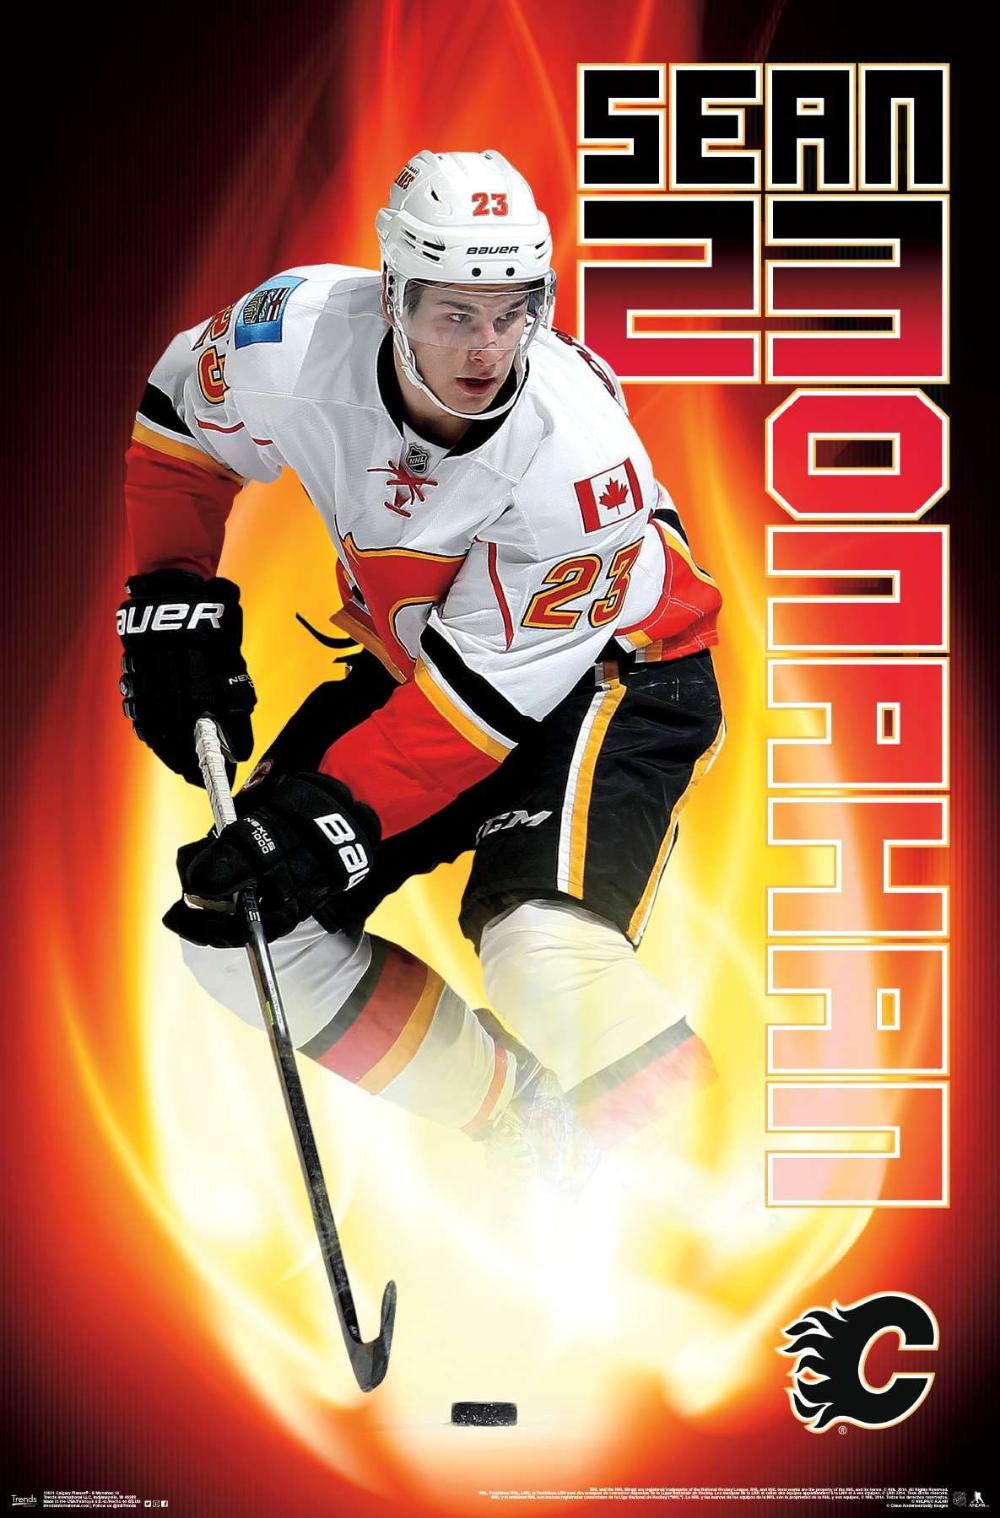 Nhl Sean Monahan Calgary Flames 14 Calgary Flames Calgary Vancouver Canucks Logo